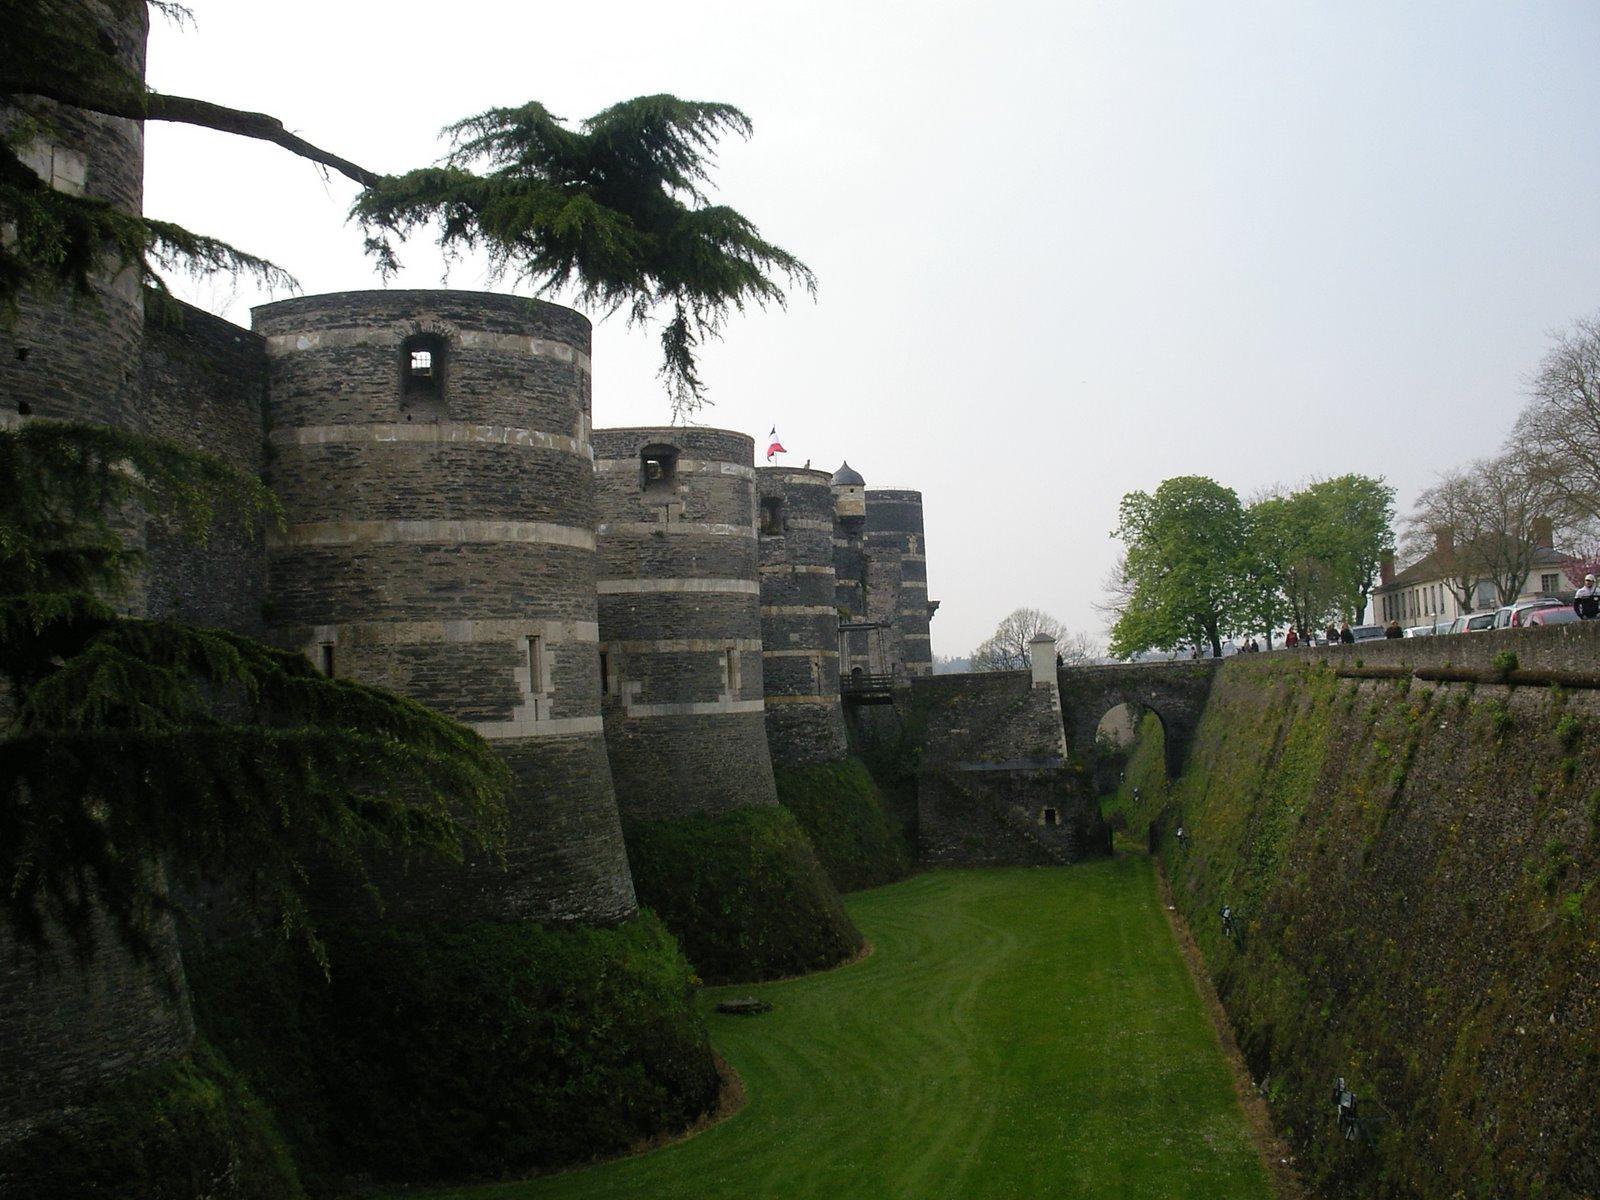 El Castillo pentagonal de Angers